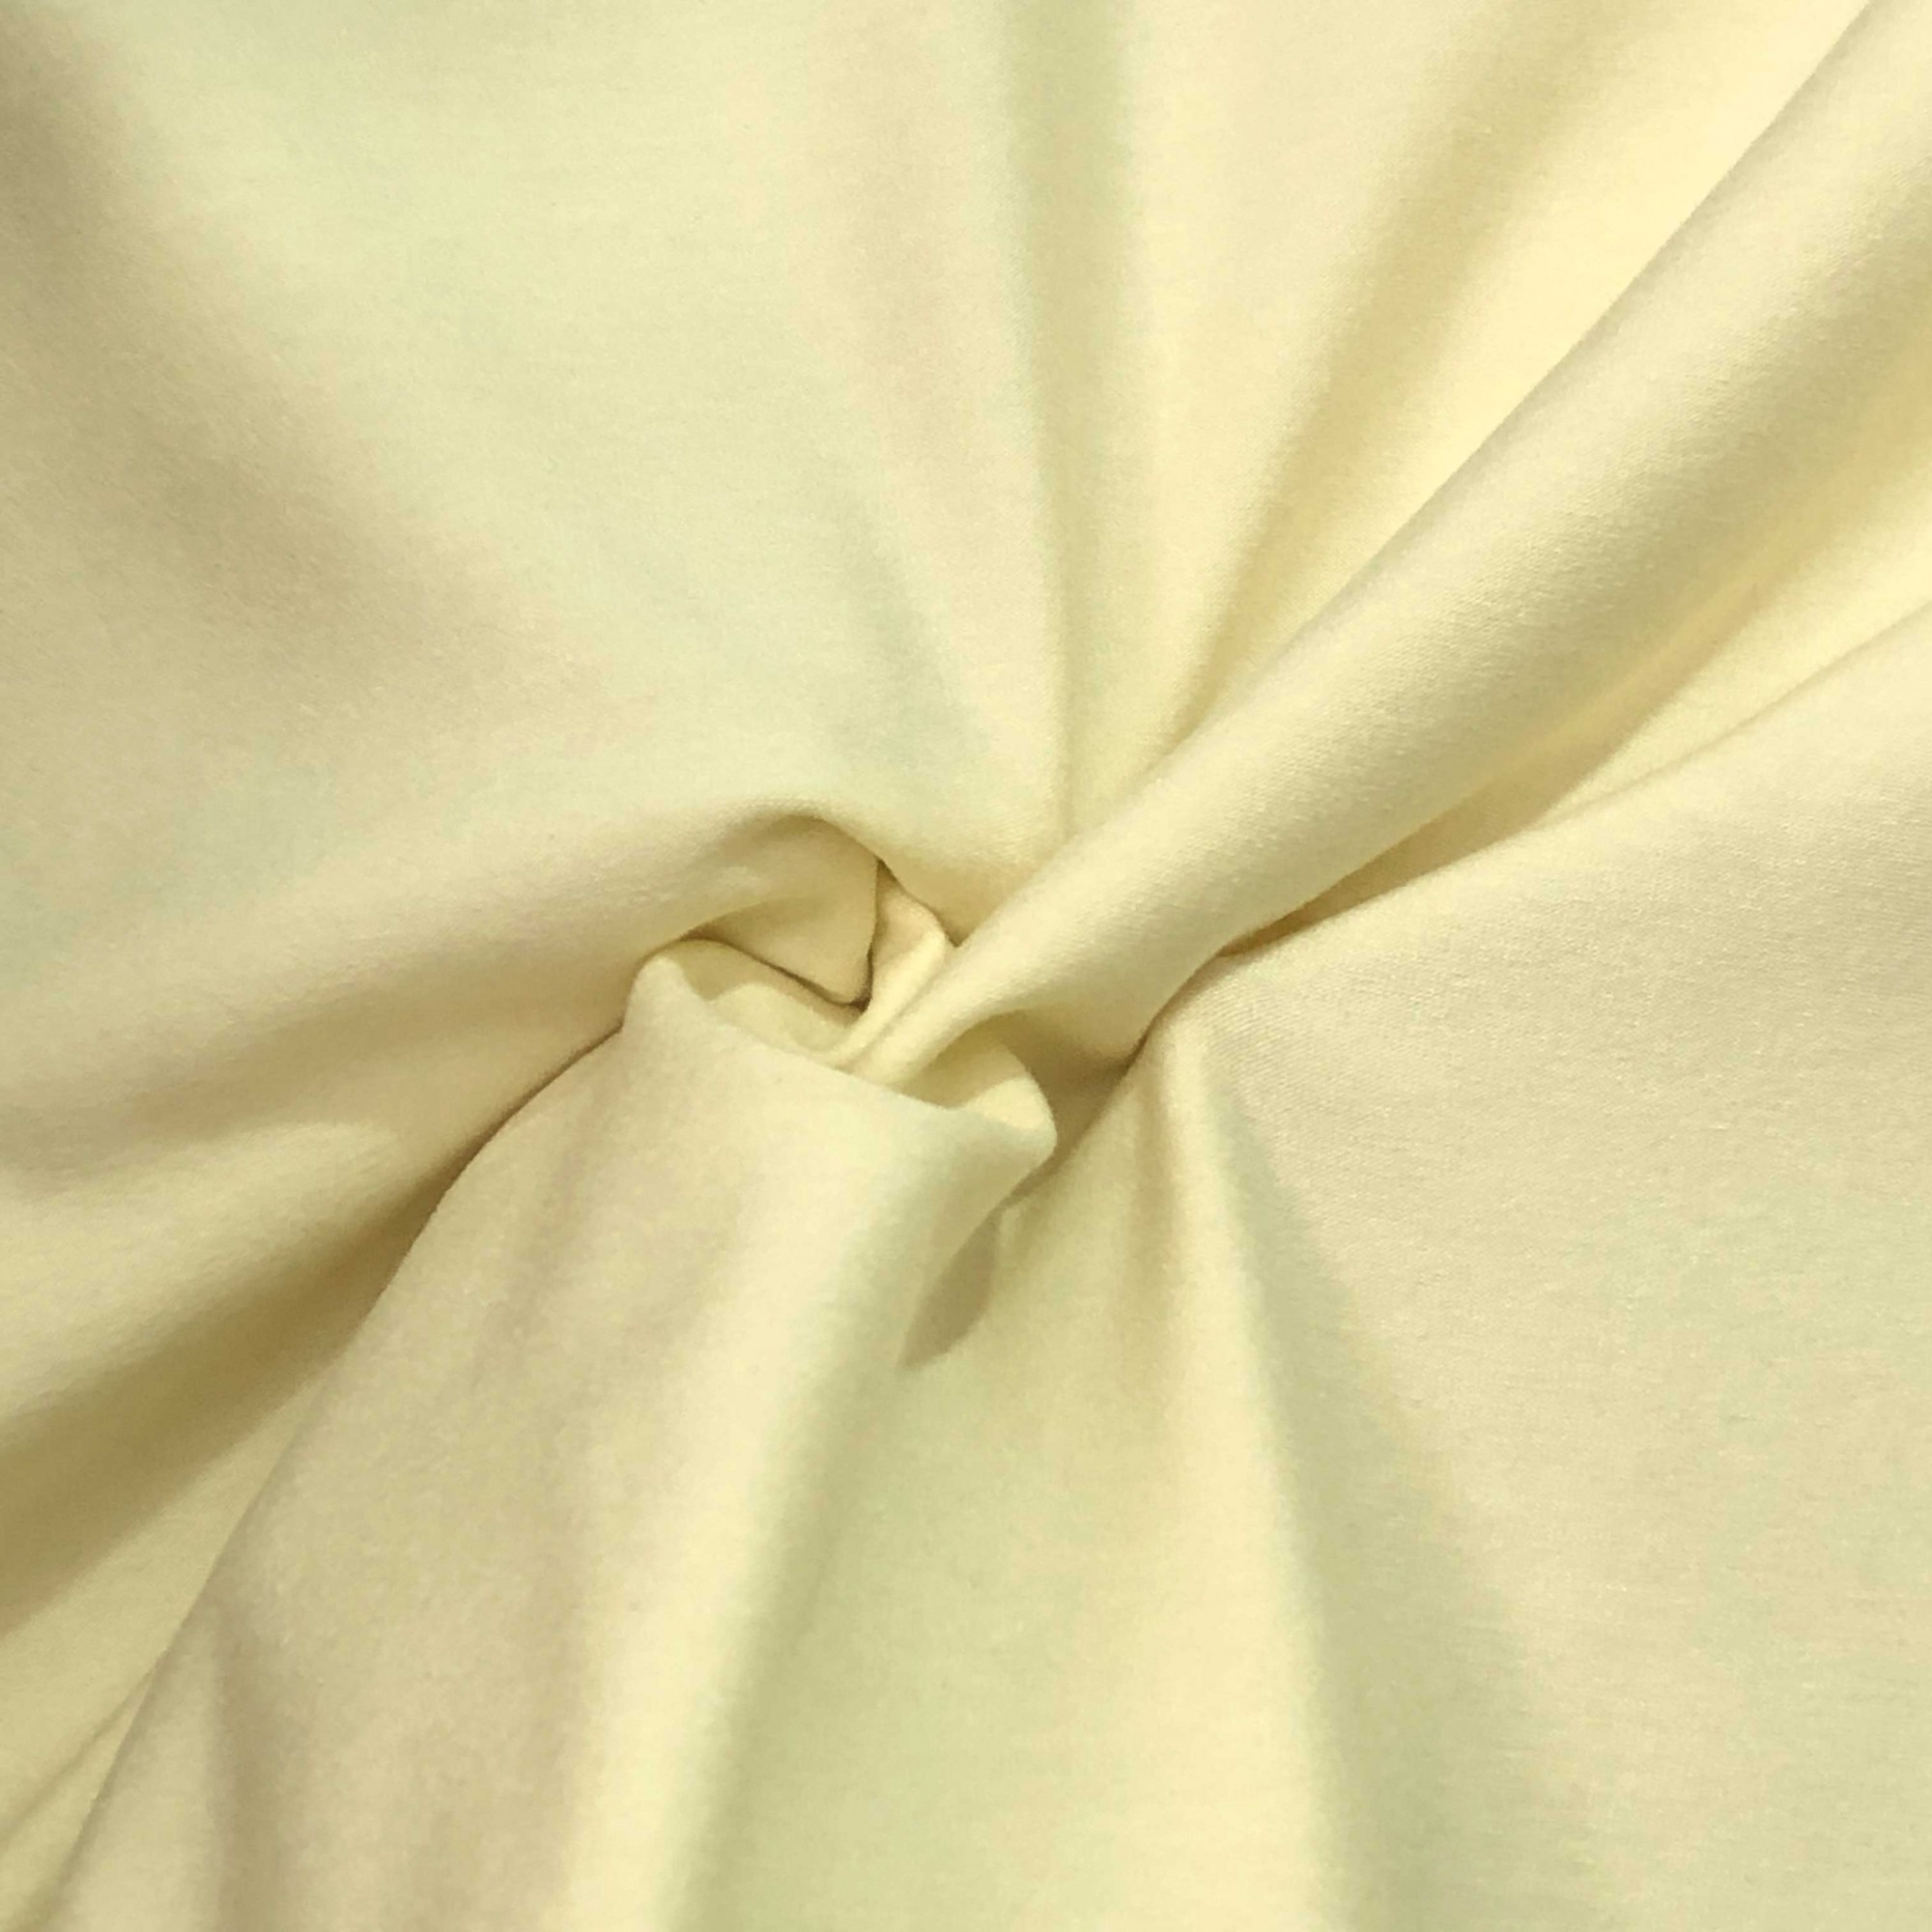 Tecido Malha Viscolycra  92%Viscose 8%Elastano Amarelo Bebê